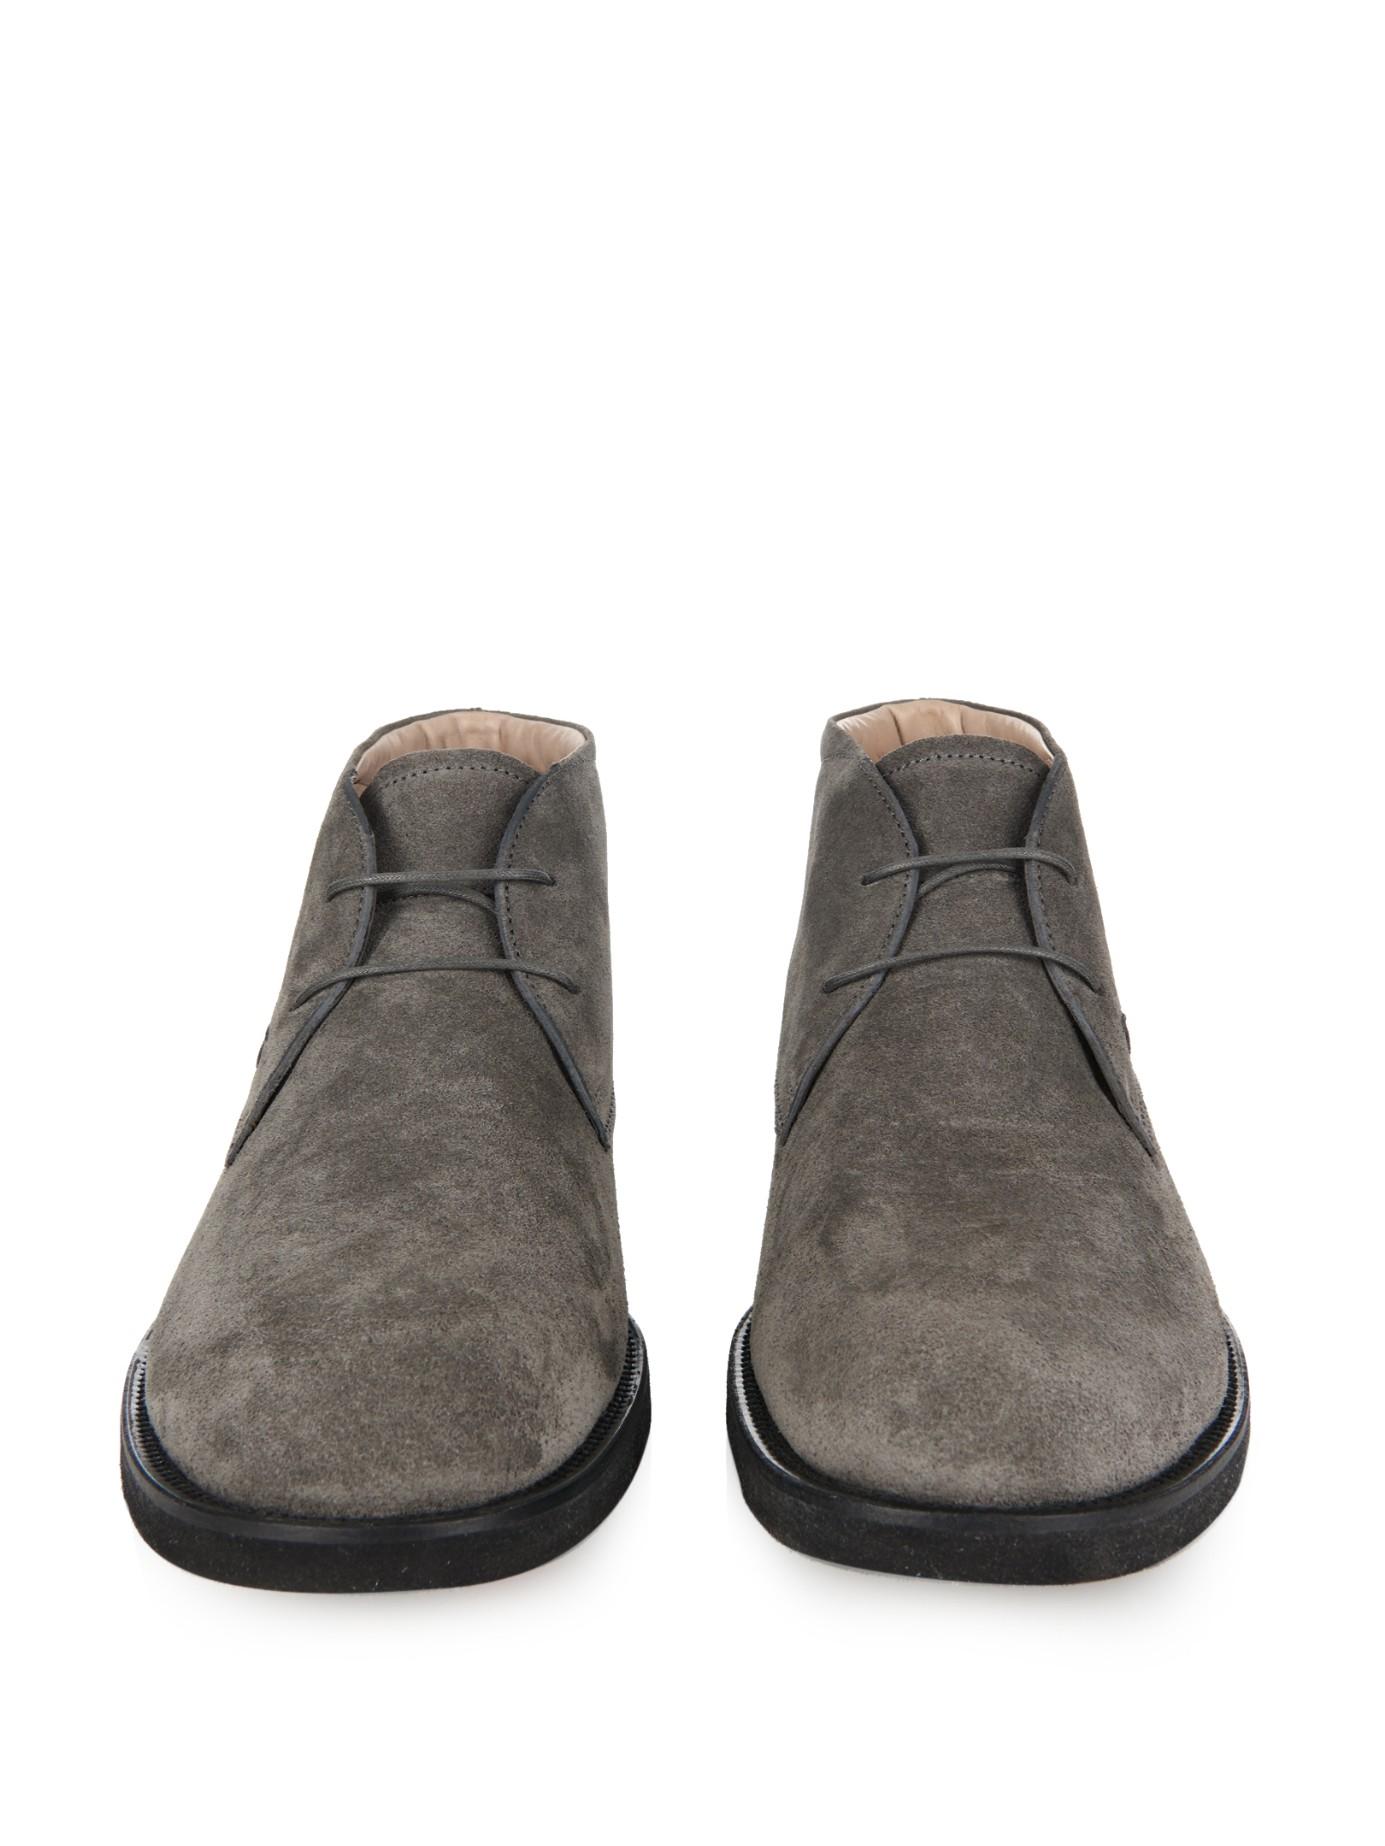 tod 39 s suede desert boots in gray for men lyst. Black Bedroom Furniture Sets. Home Design Ideas